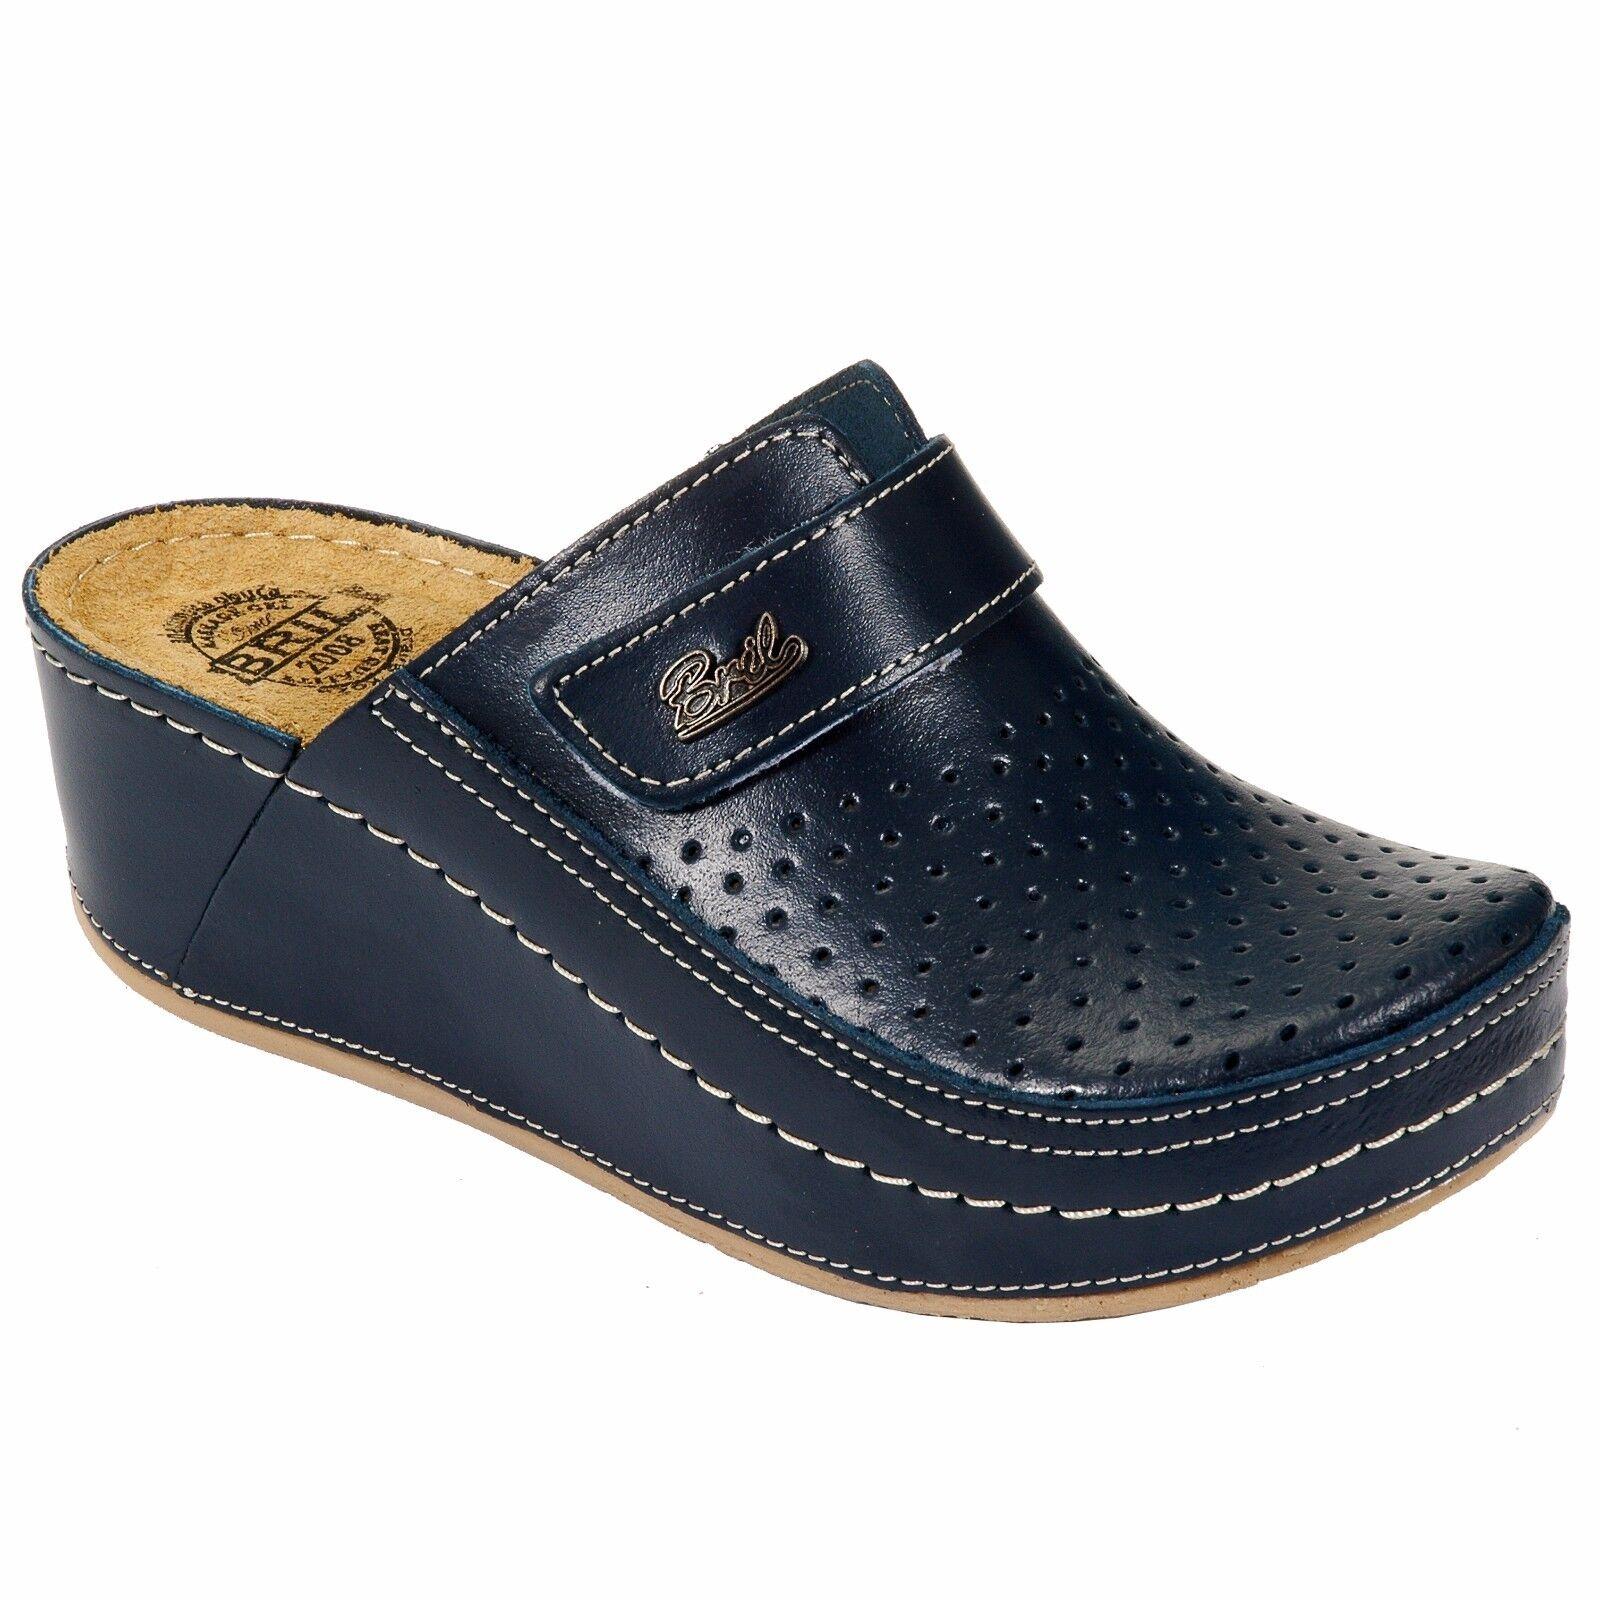 DR PUNTO ROSSO ECO IN PELLE DONNA D130 Slip On Clogs Pantofole Scarpe, Blu